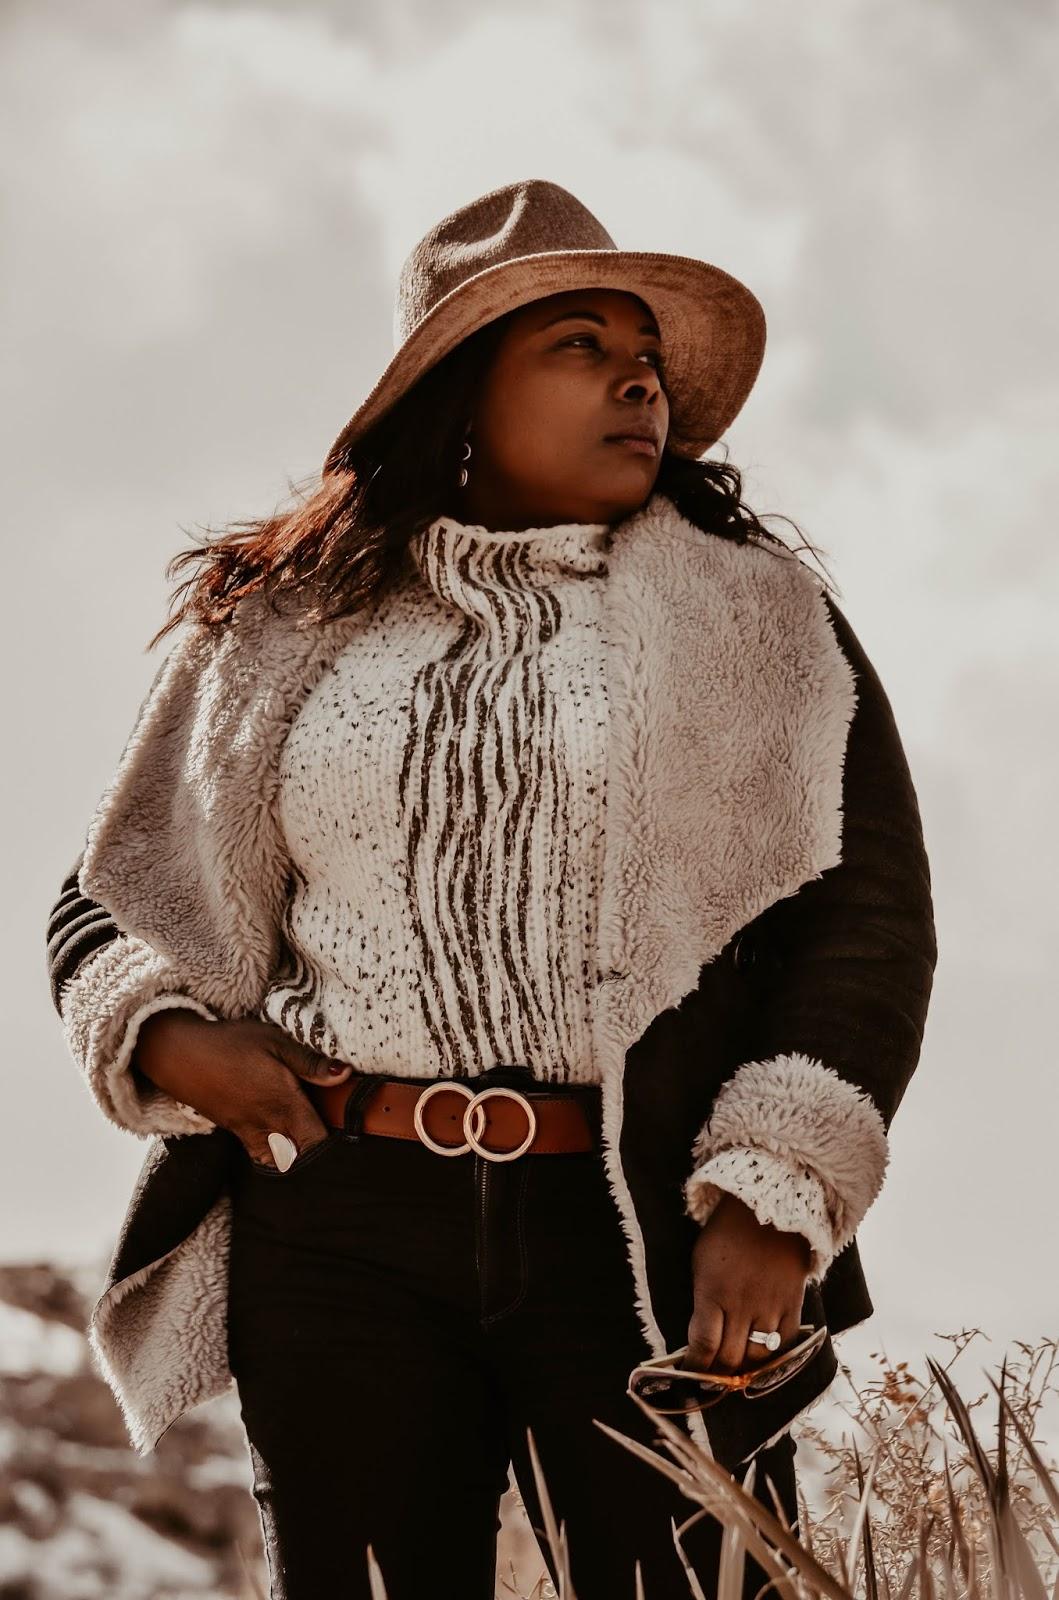 cowgirl-paige-denim-bootleg-jeans-pants-anthropologie-blush-plush-chenille-hat-guess-double-ring-belt-vintage-cateye-sunglasses-at-snowy-mount-charleston-lasvegas-nv